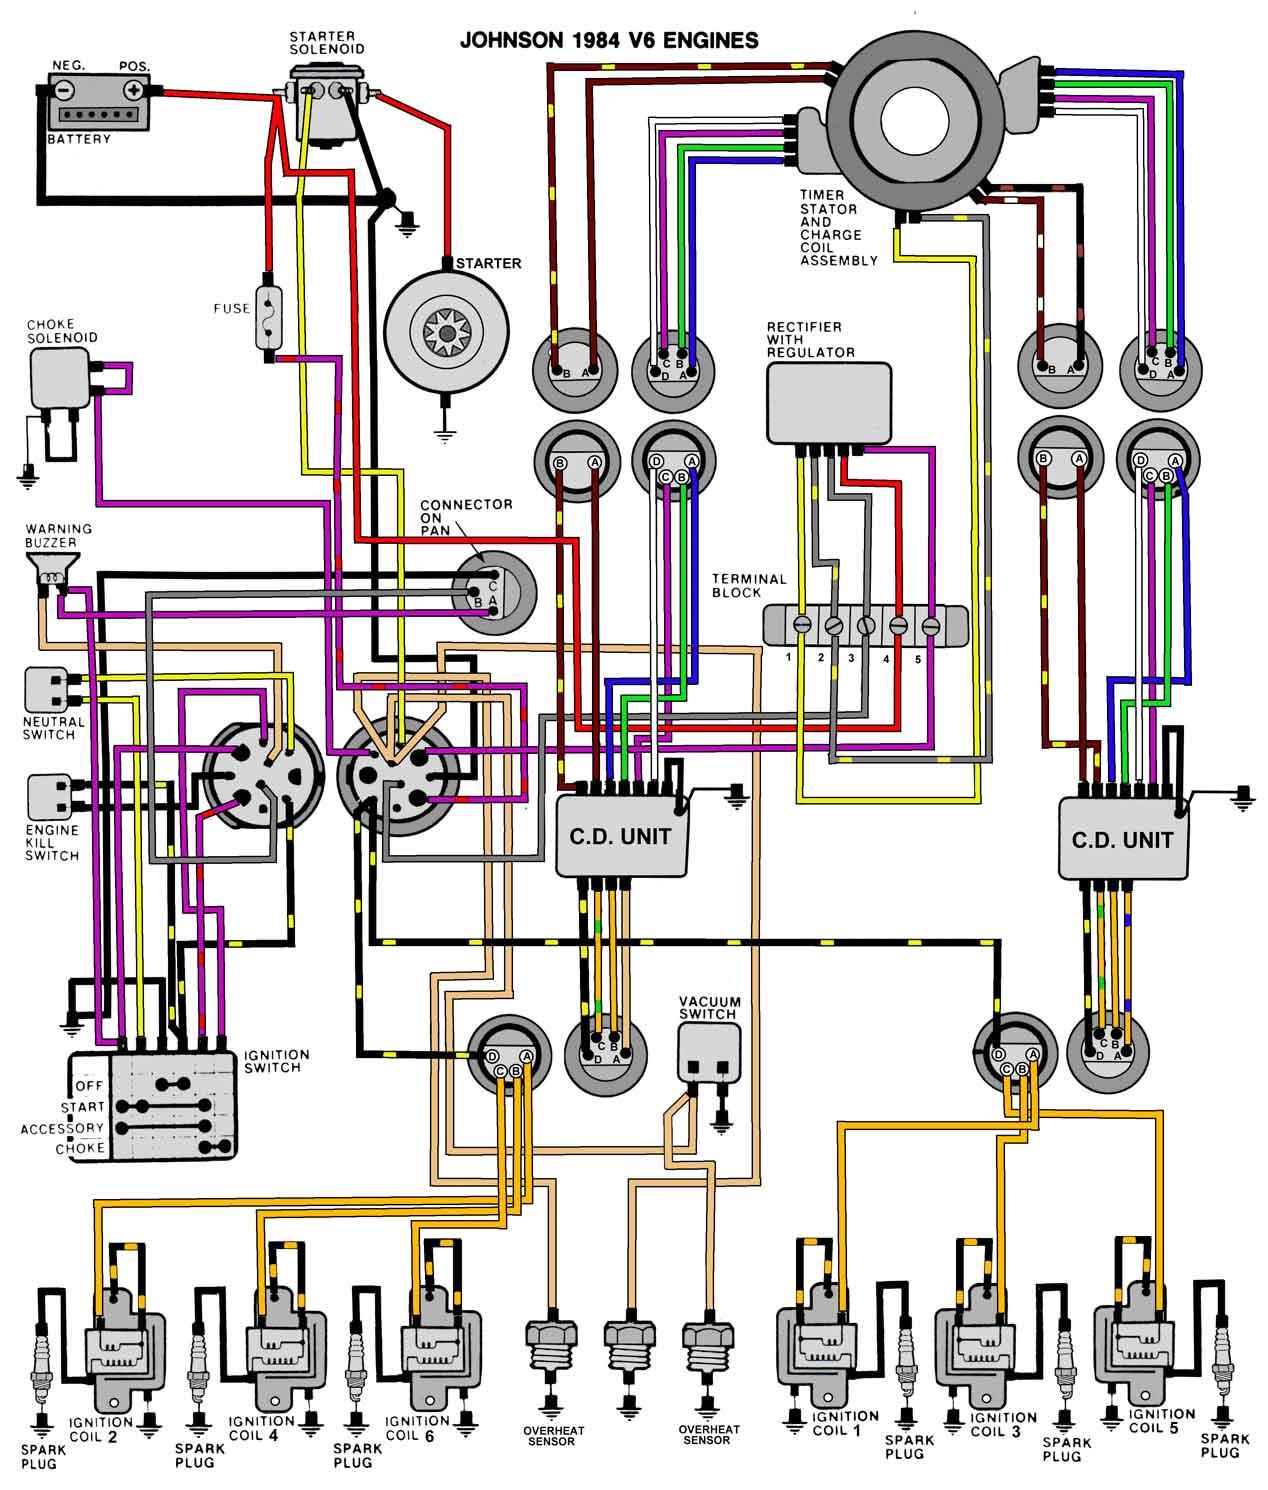 1973 evinrude 135 wiring diagram rh pictureshoes club Evinrude Outboard 135 Evinrude Power Pack Wiring